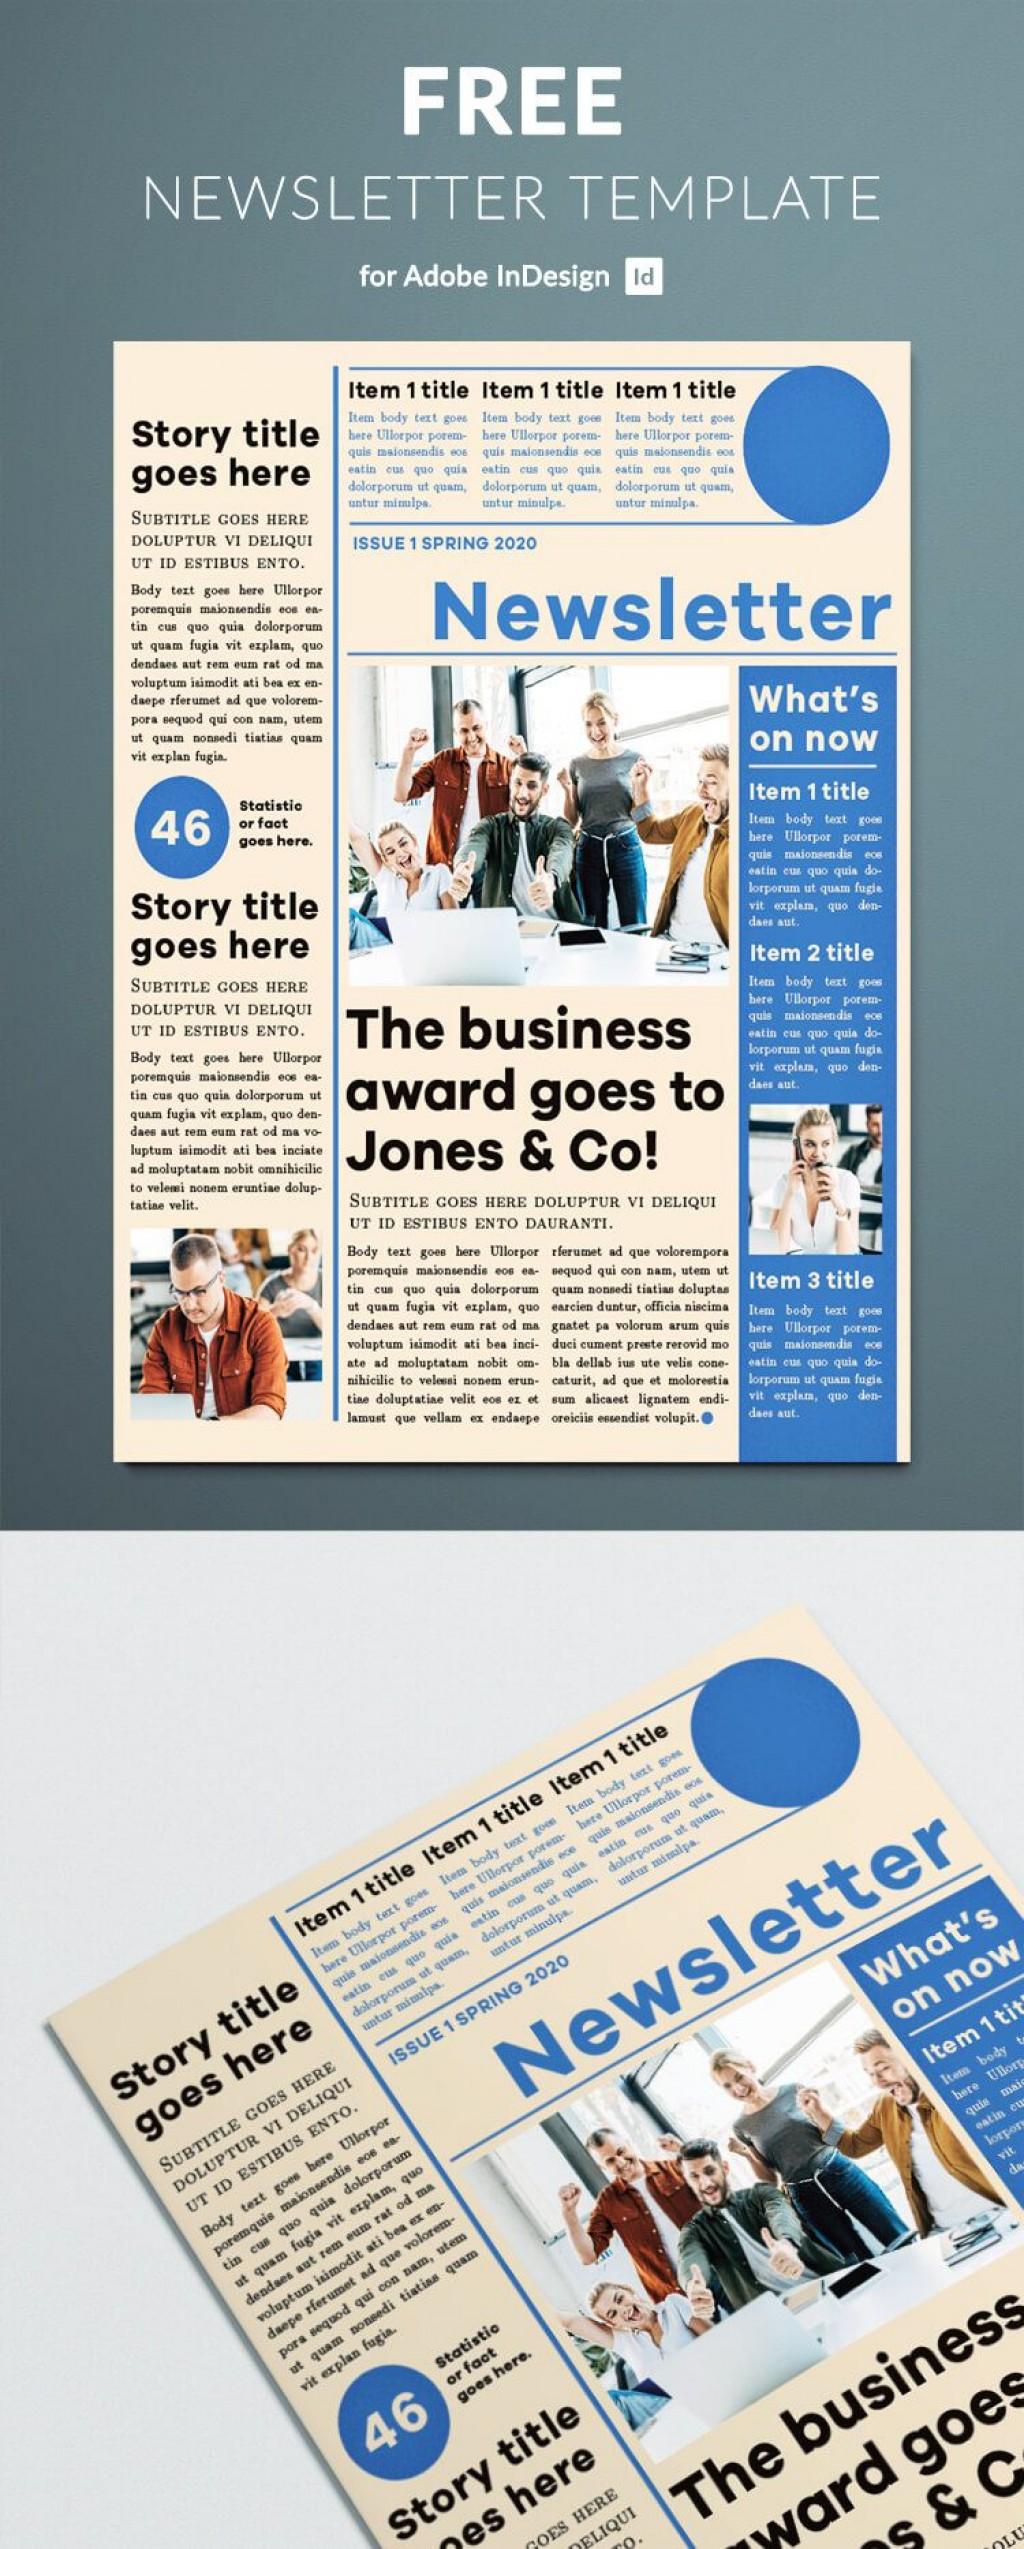 007 Stunning Adobe Indesign Newsletter Template Free Download Inspiration Large